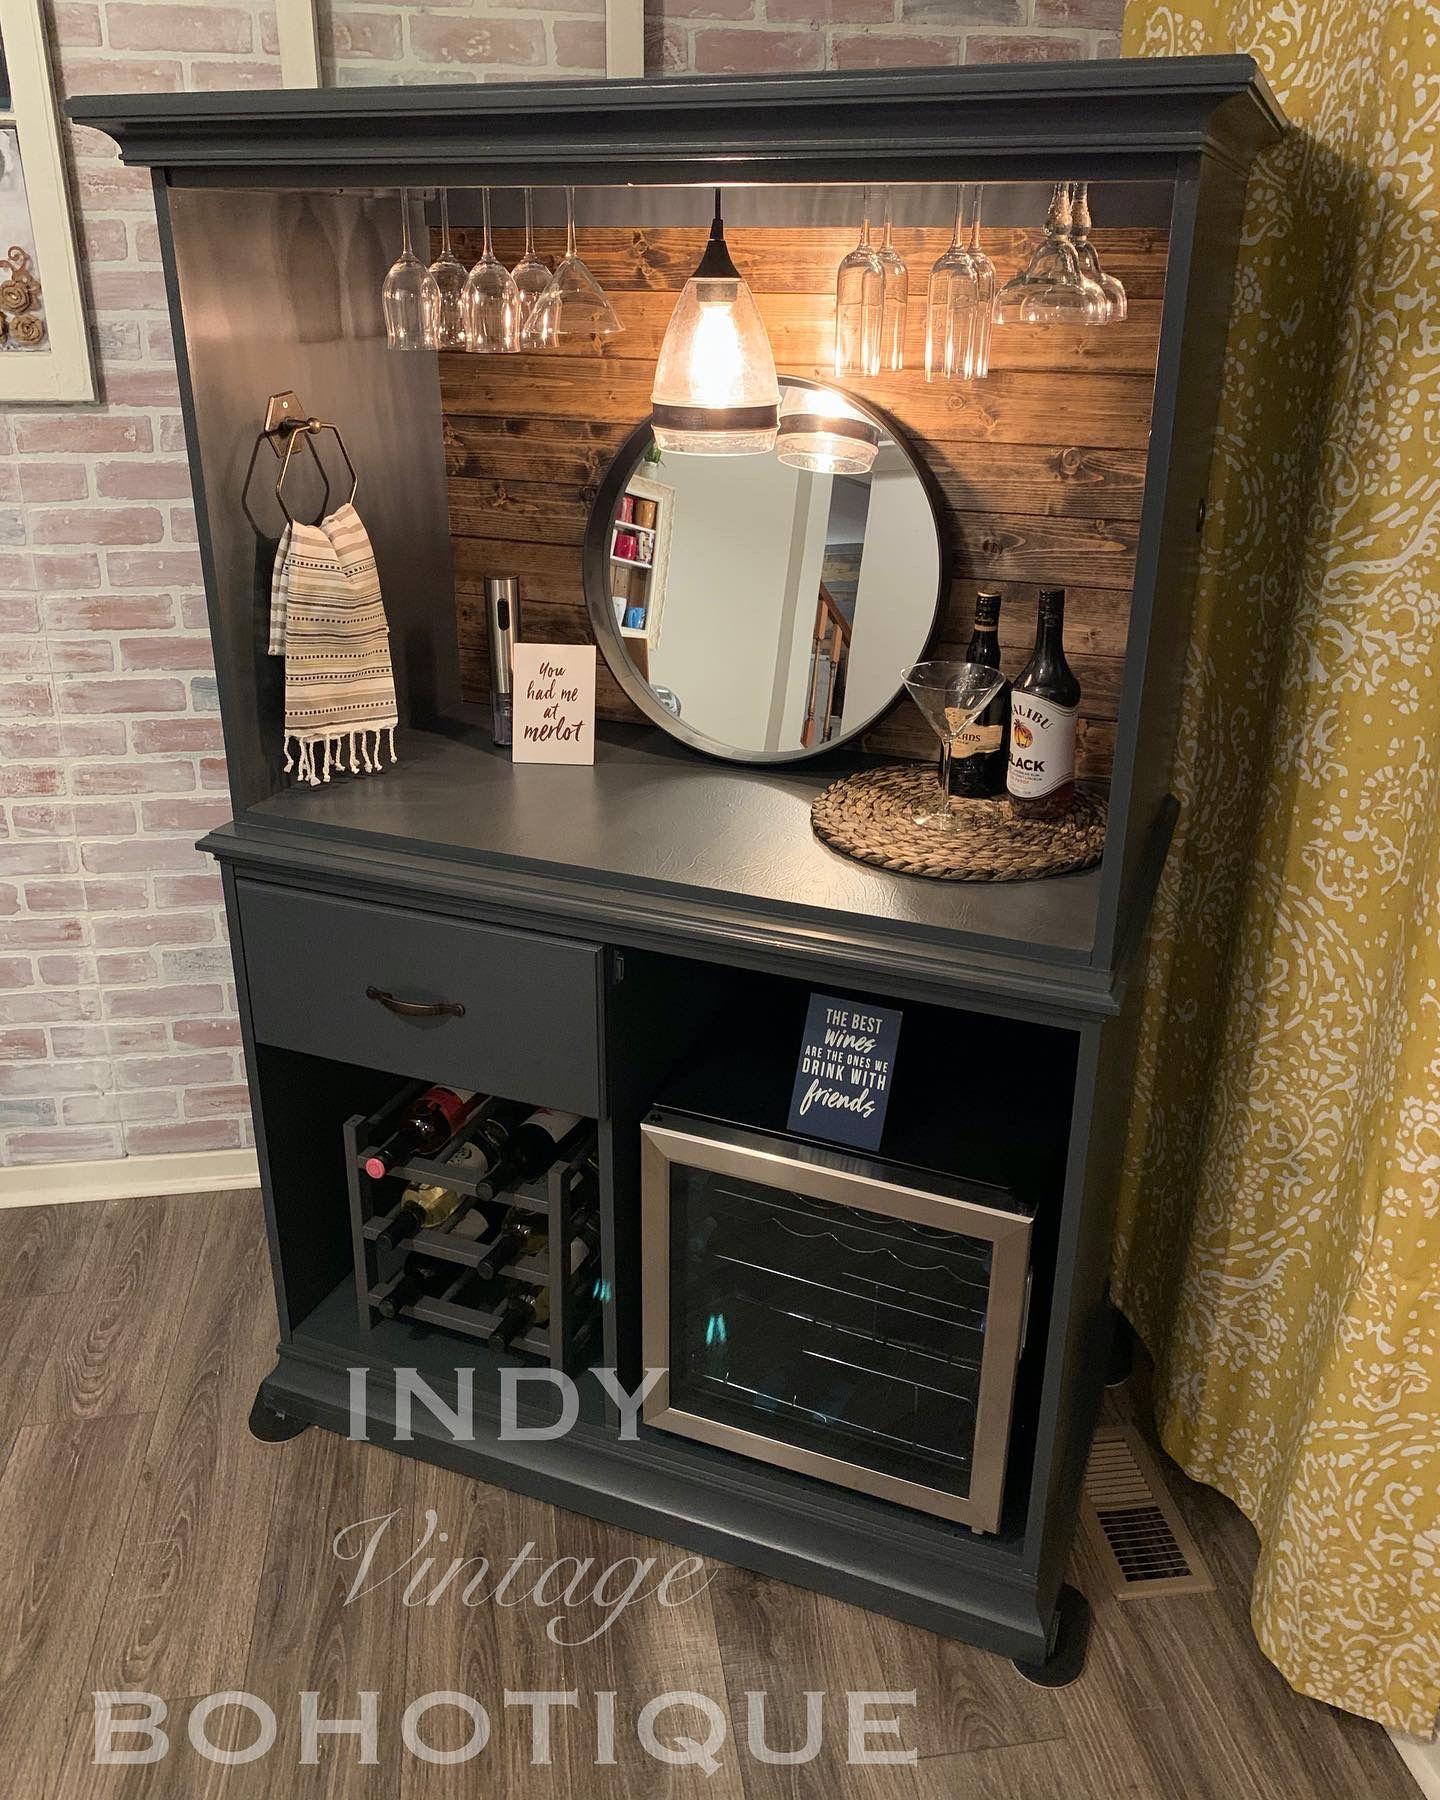 Custom Armoire Wine Liquor Bar Beverage Bar Rustic Bar Etsy In 2020 Coffee Bar Home Bars For Home Rustic Bar